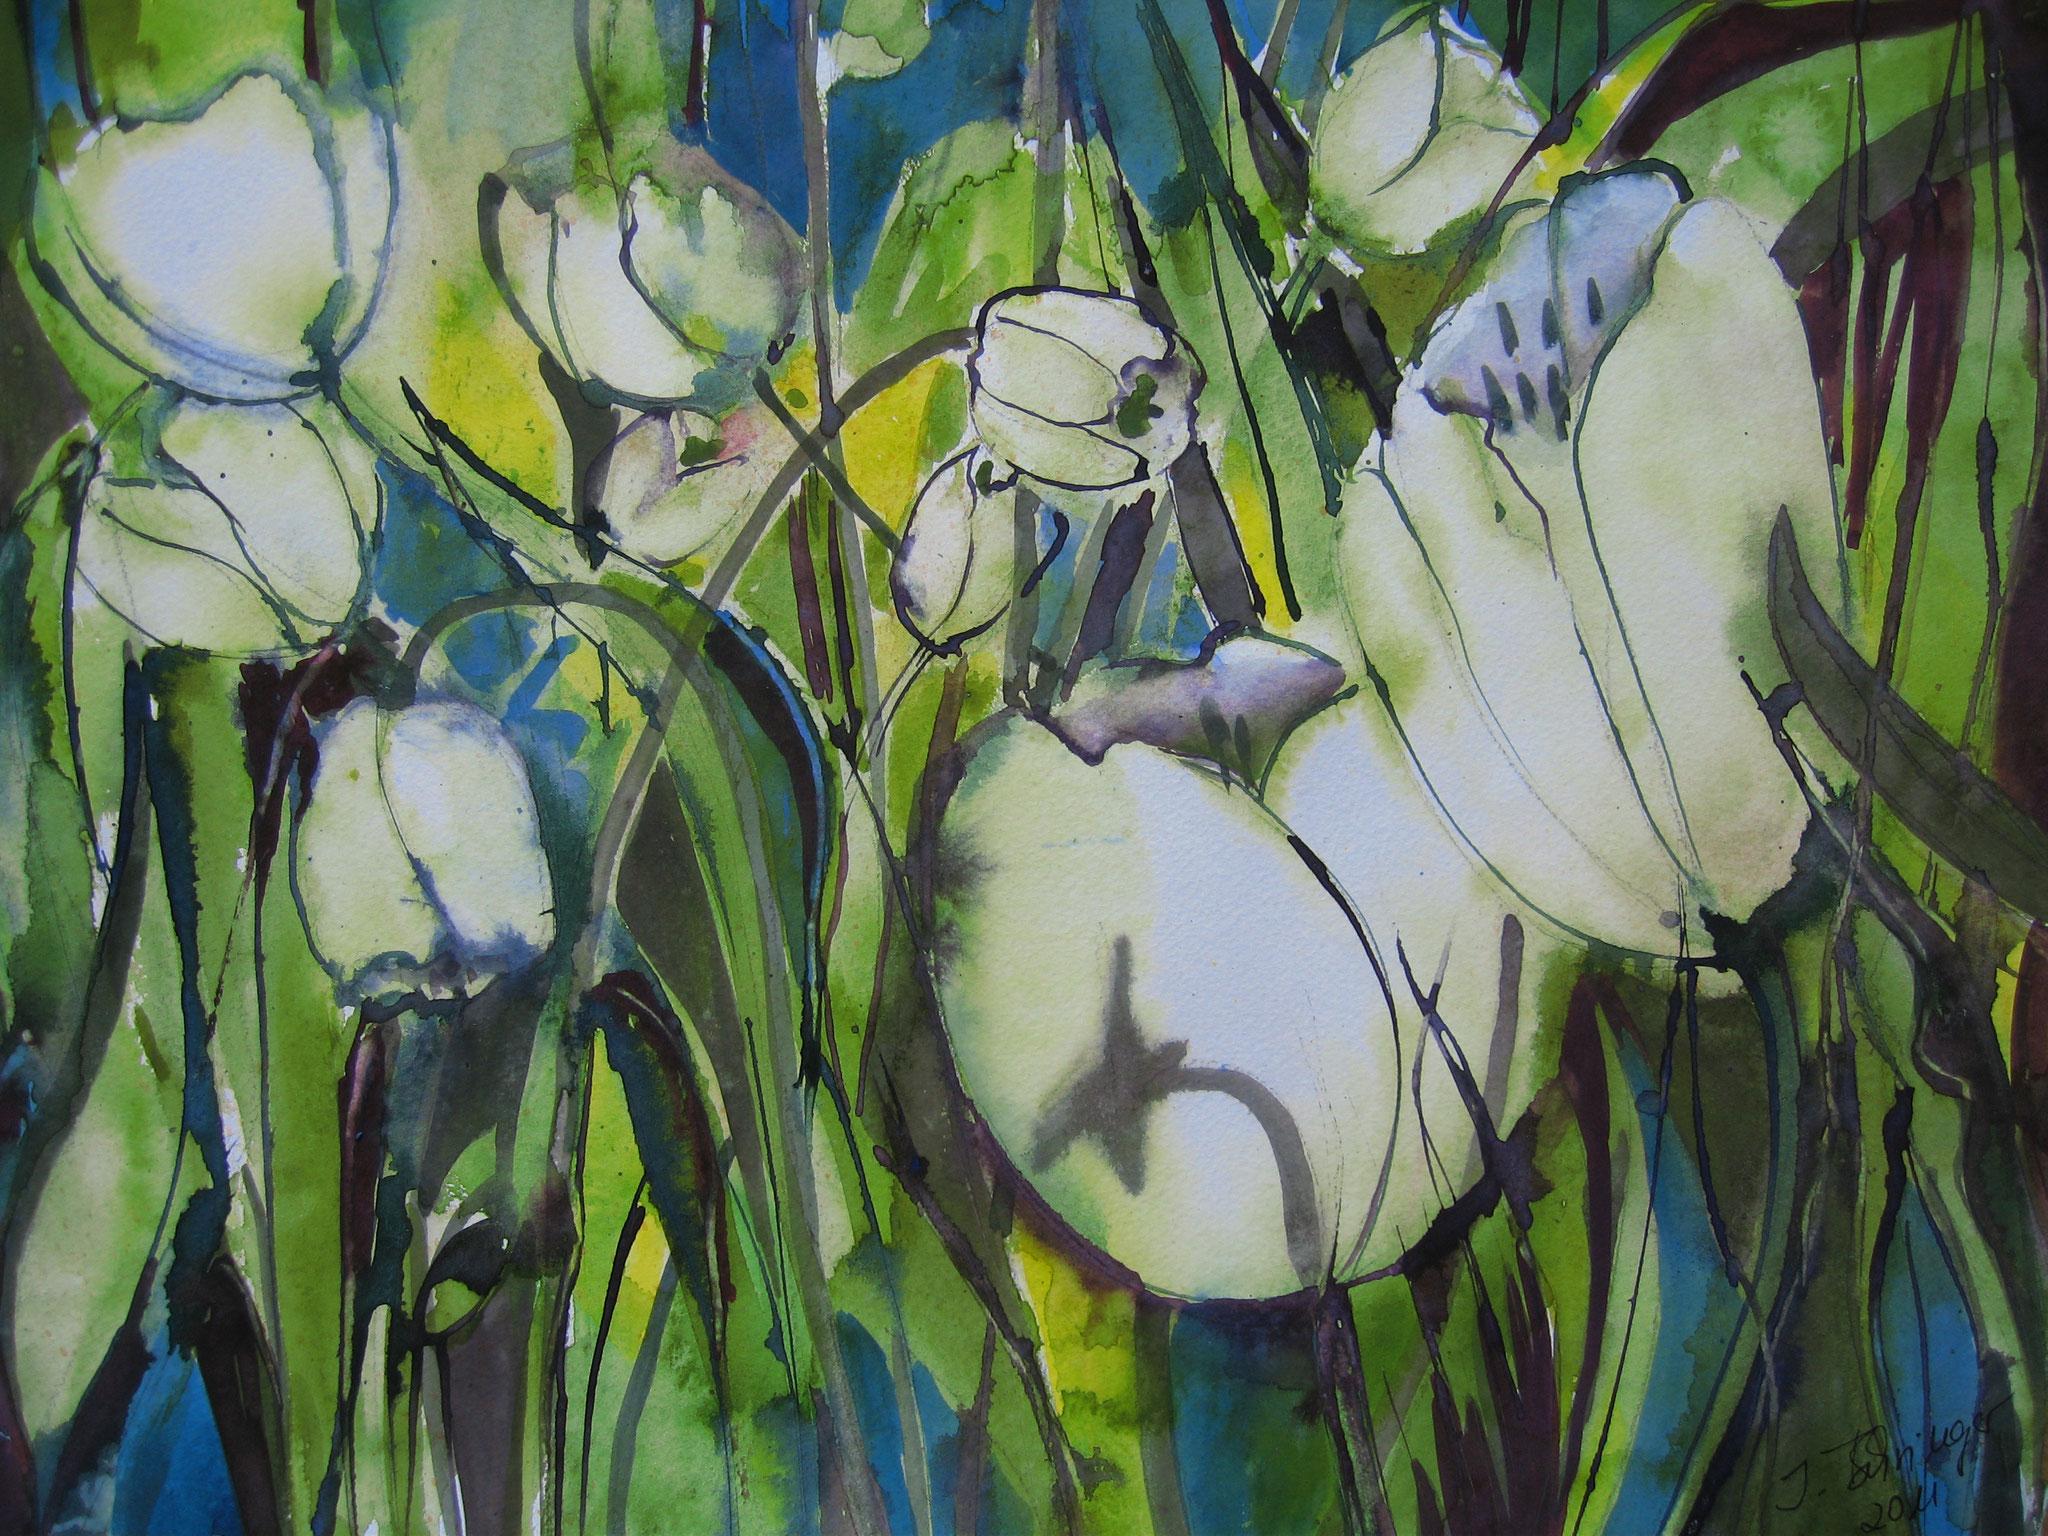 Tulpenmeer, Aquarell, 31 x 43 cm